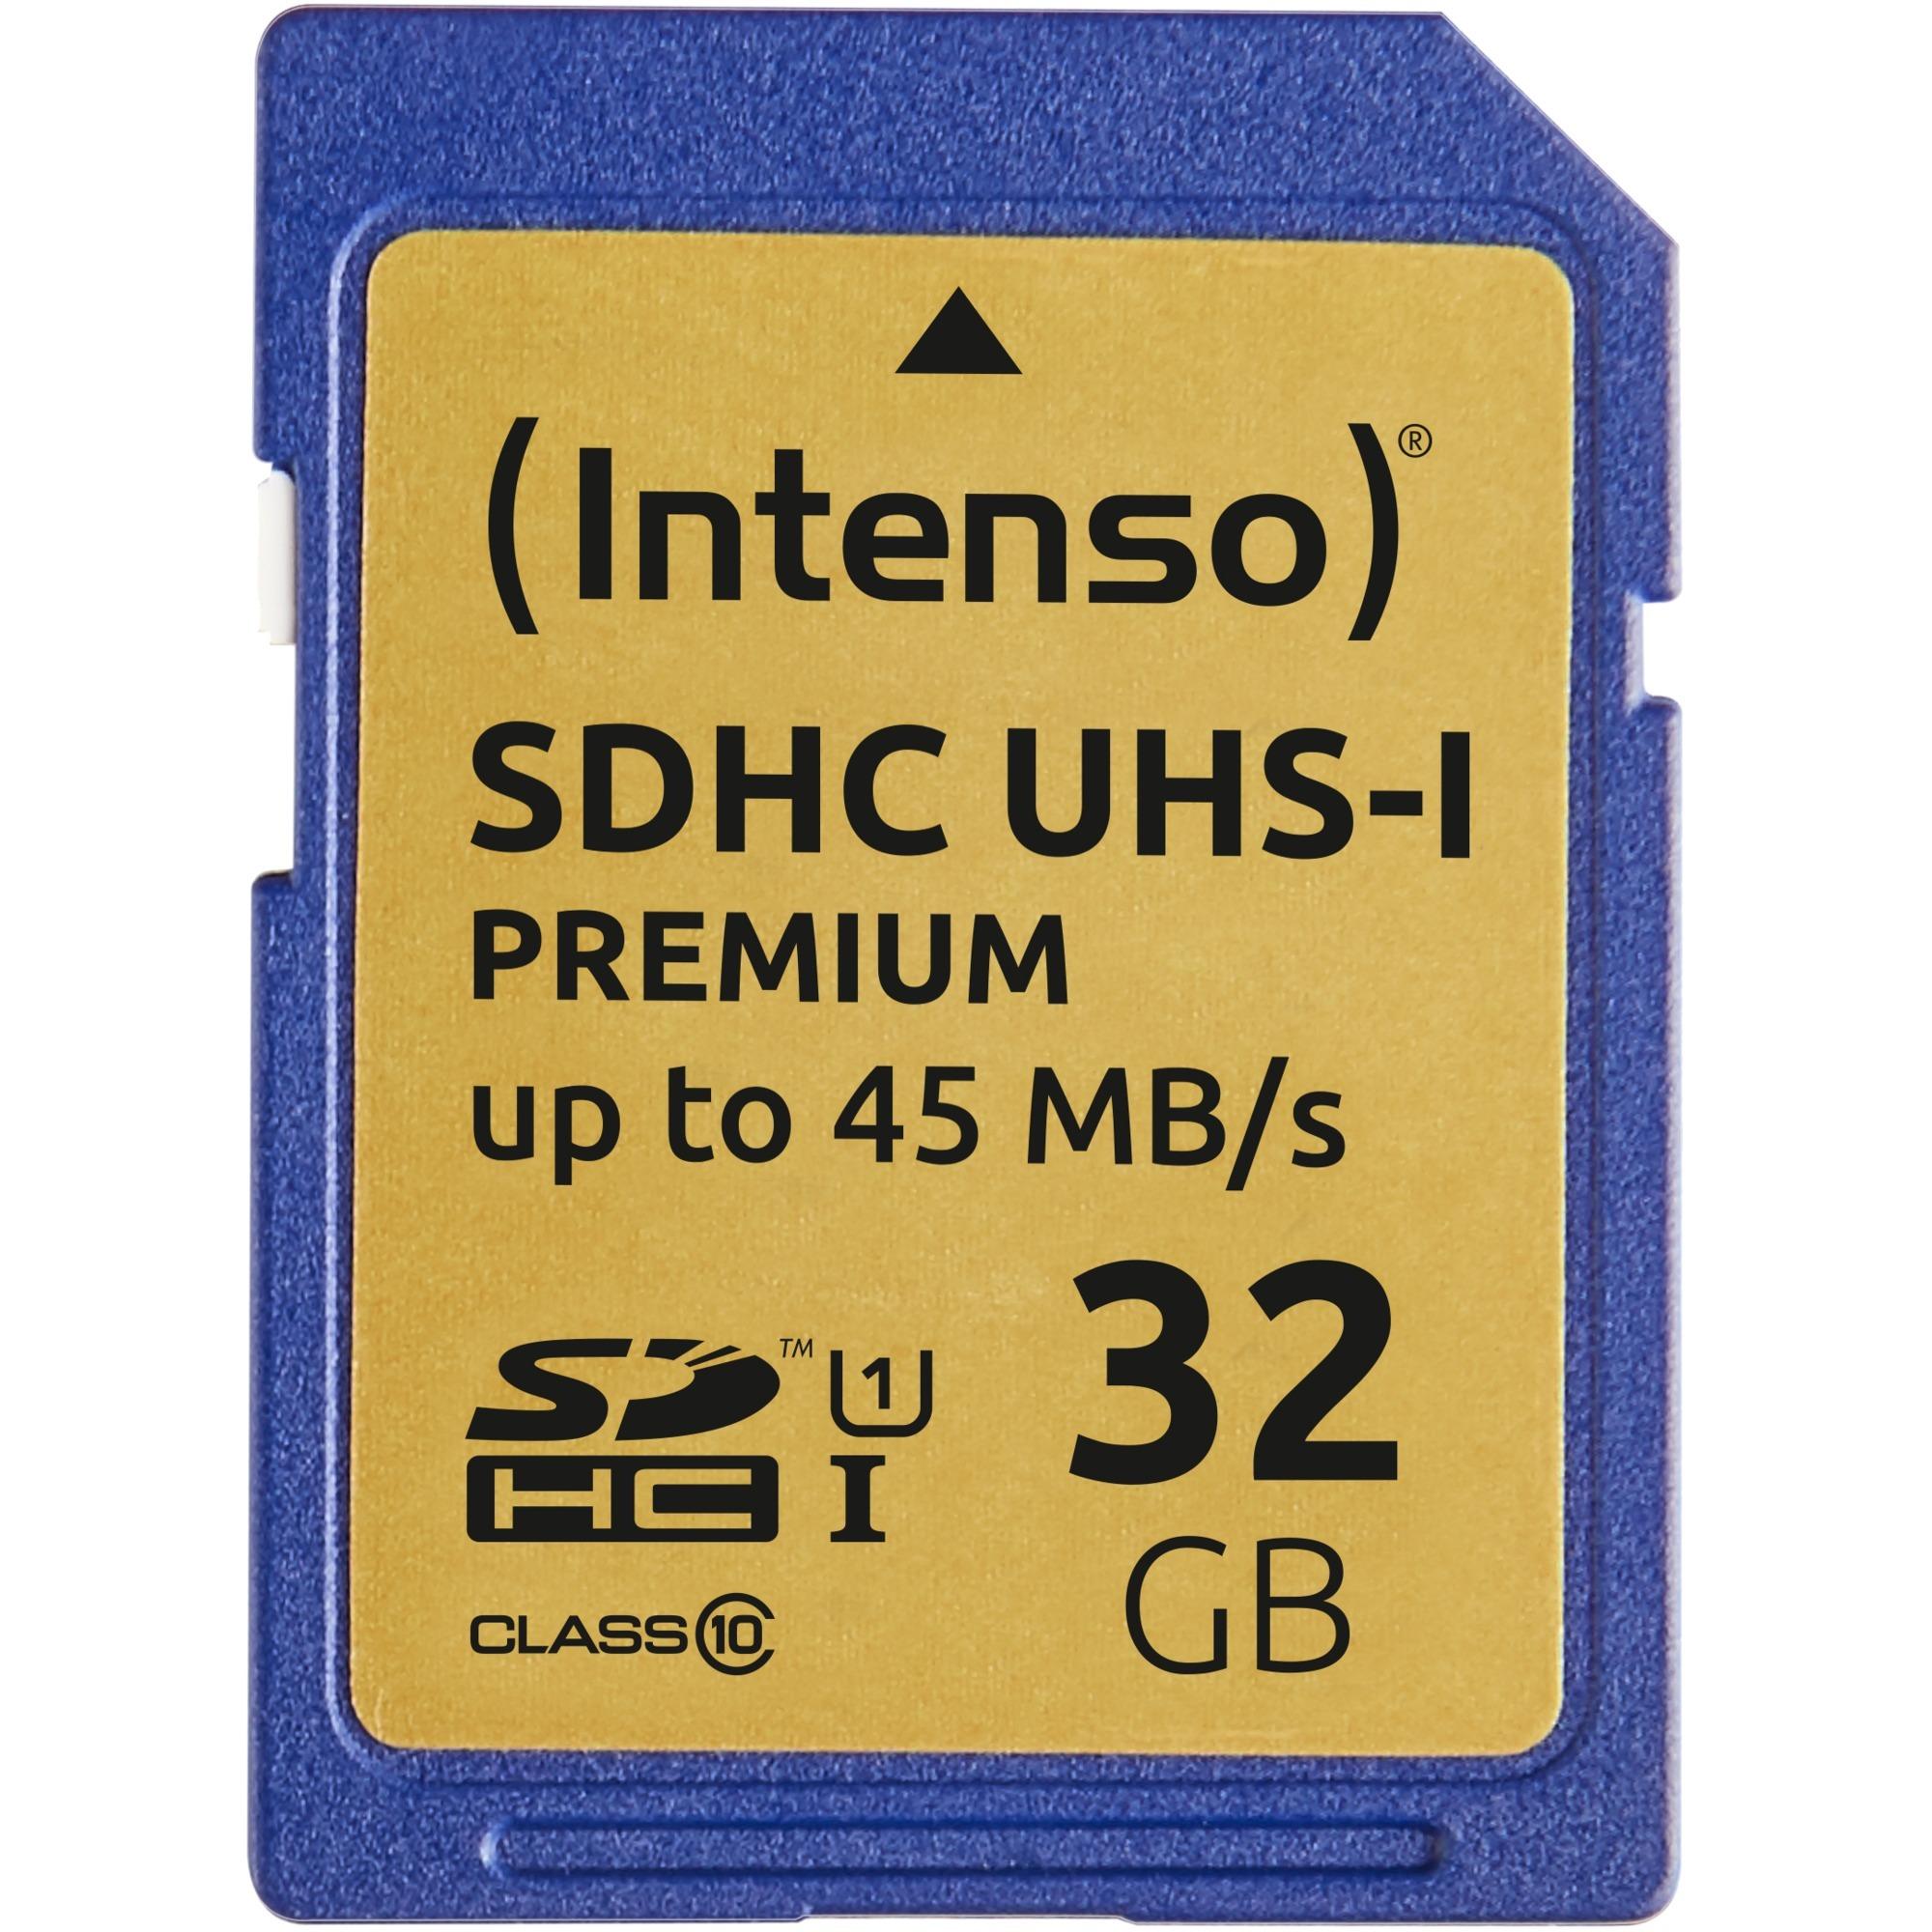 32gb-sdhc-32gb-sdhc-uhs-klasse-10-flash-hukommelse-hukommelseskort